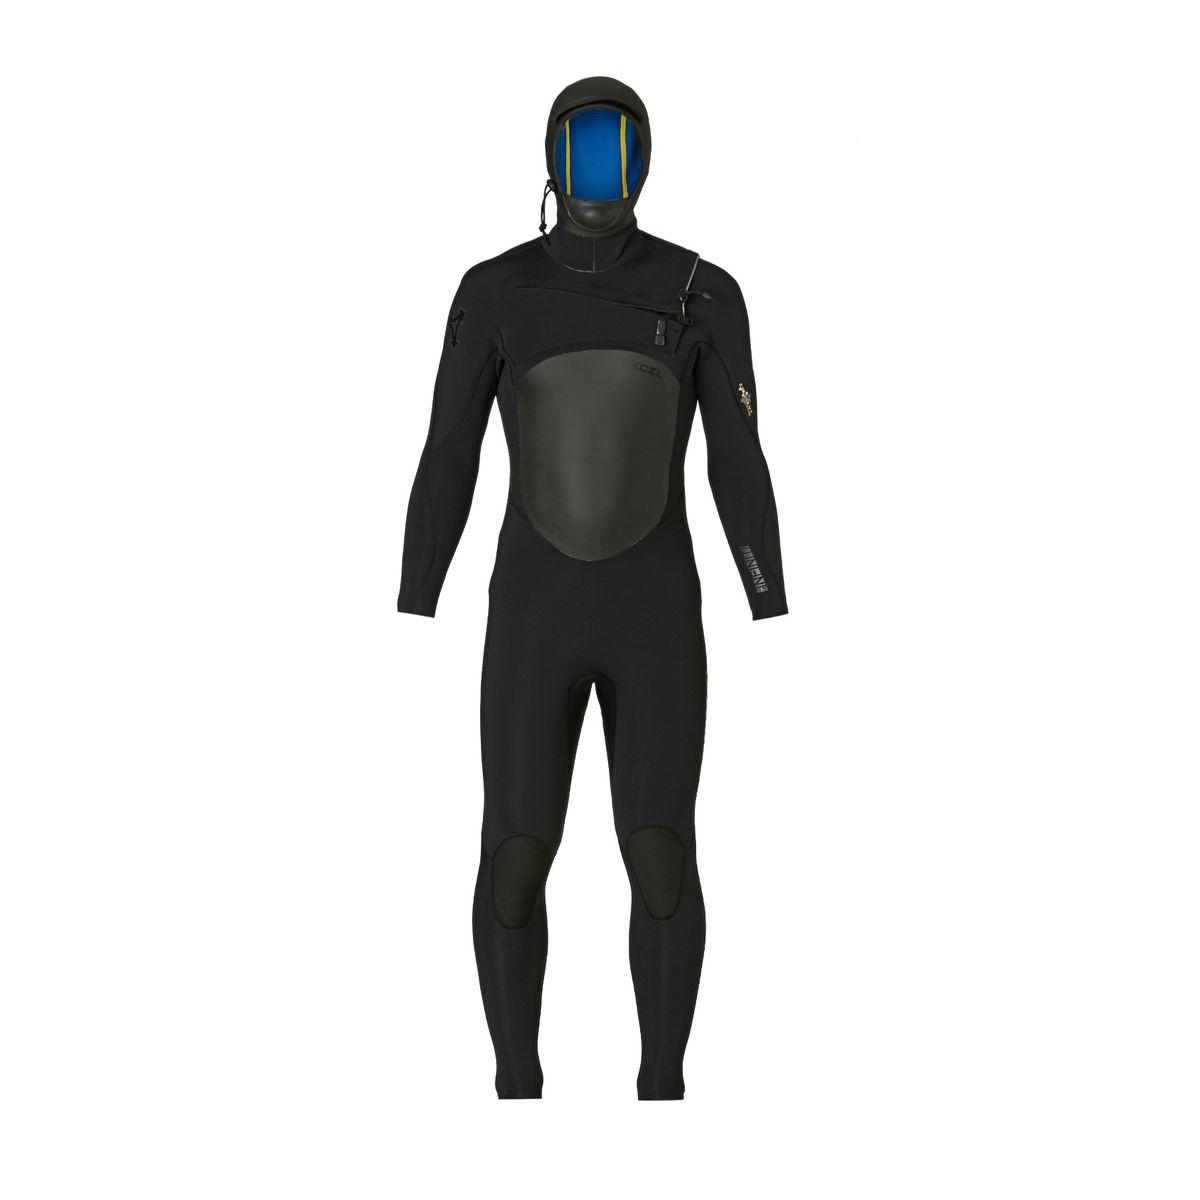 Xcel Infiniti 6/5/4mm Hooded X2 2017 Chest Zip Wetsuit - Black